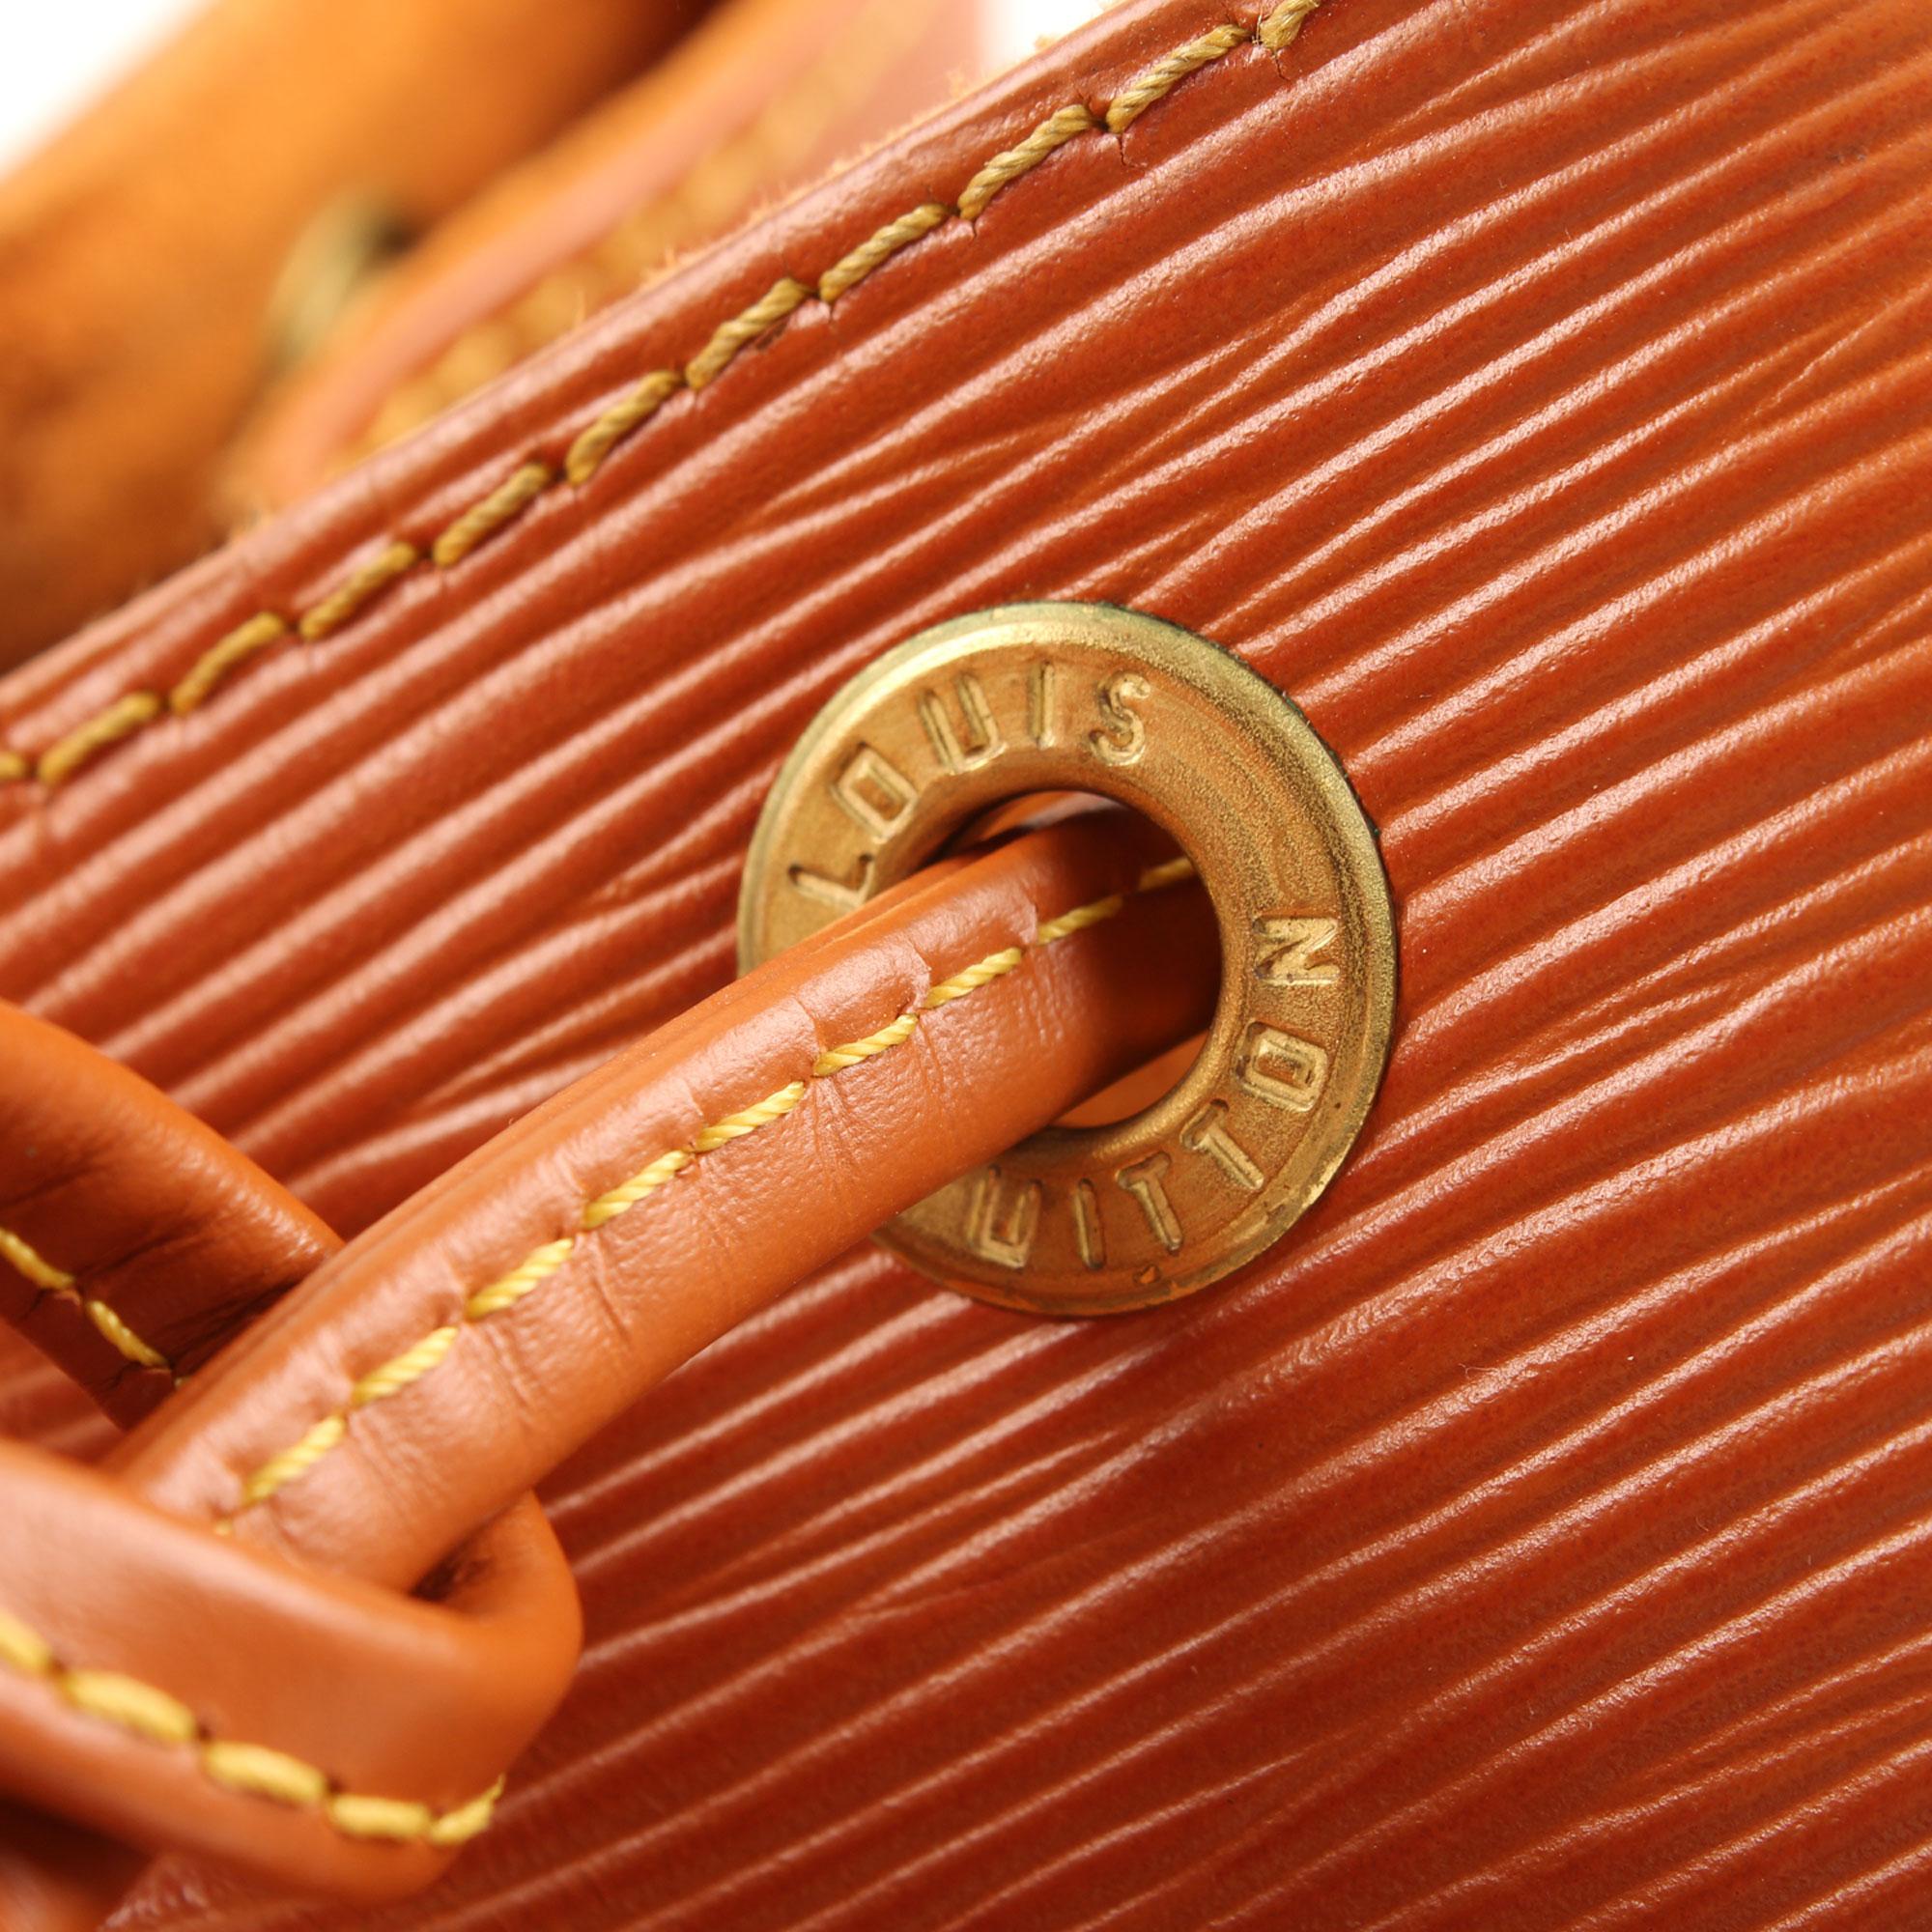 Imagen del detalle del herraje del bolso louis vuitton noe piel epi marron detalle